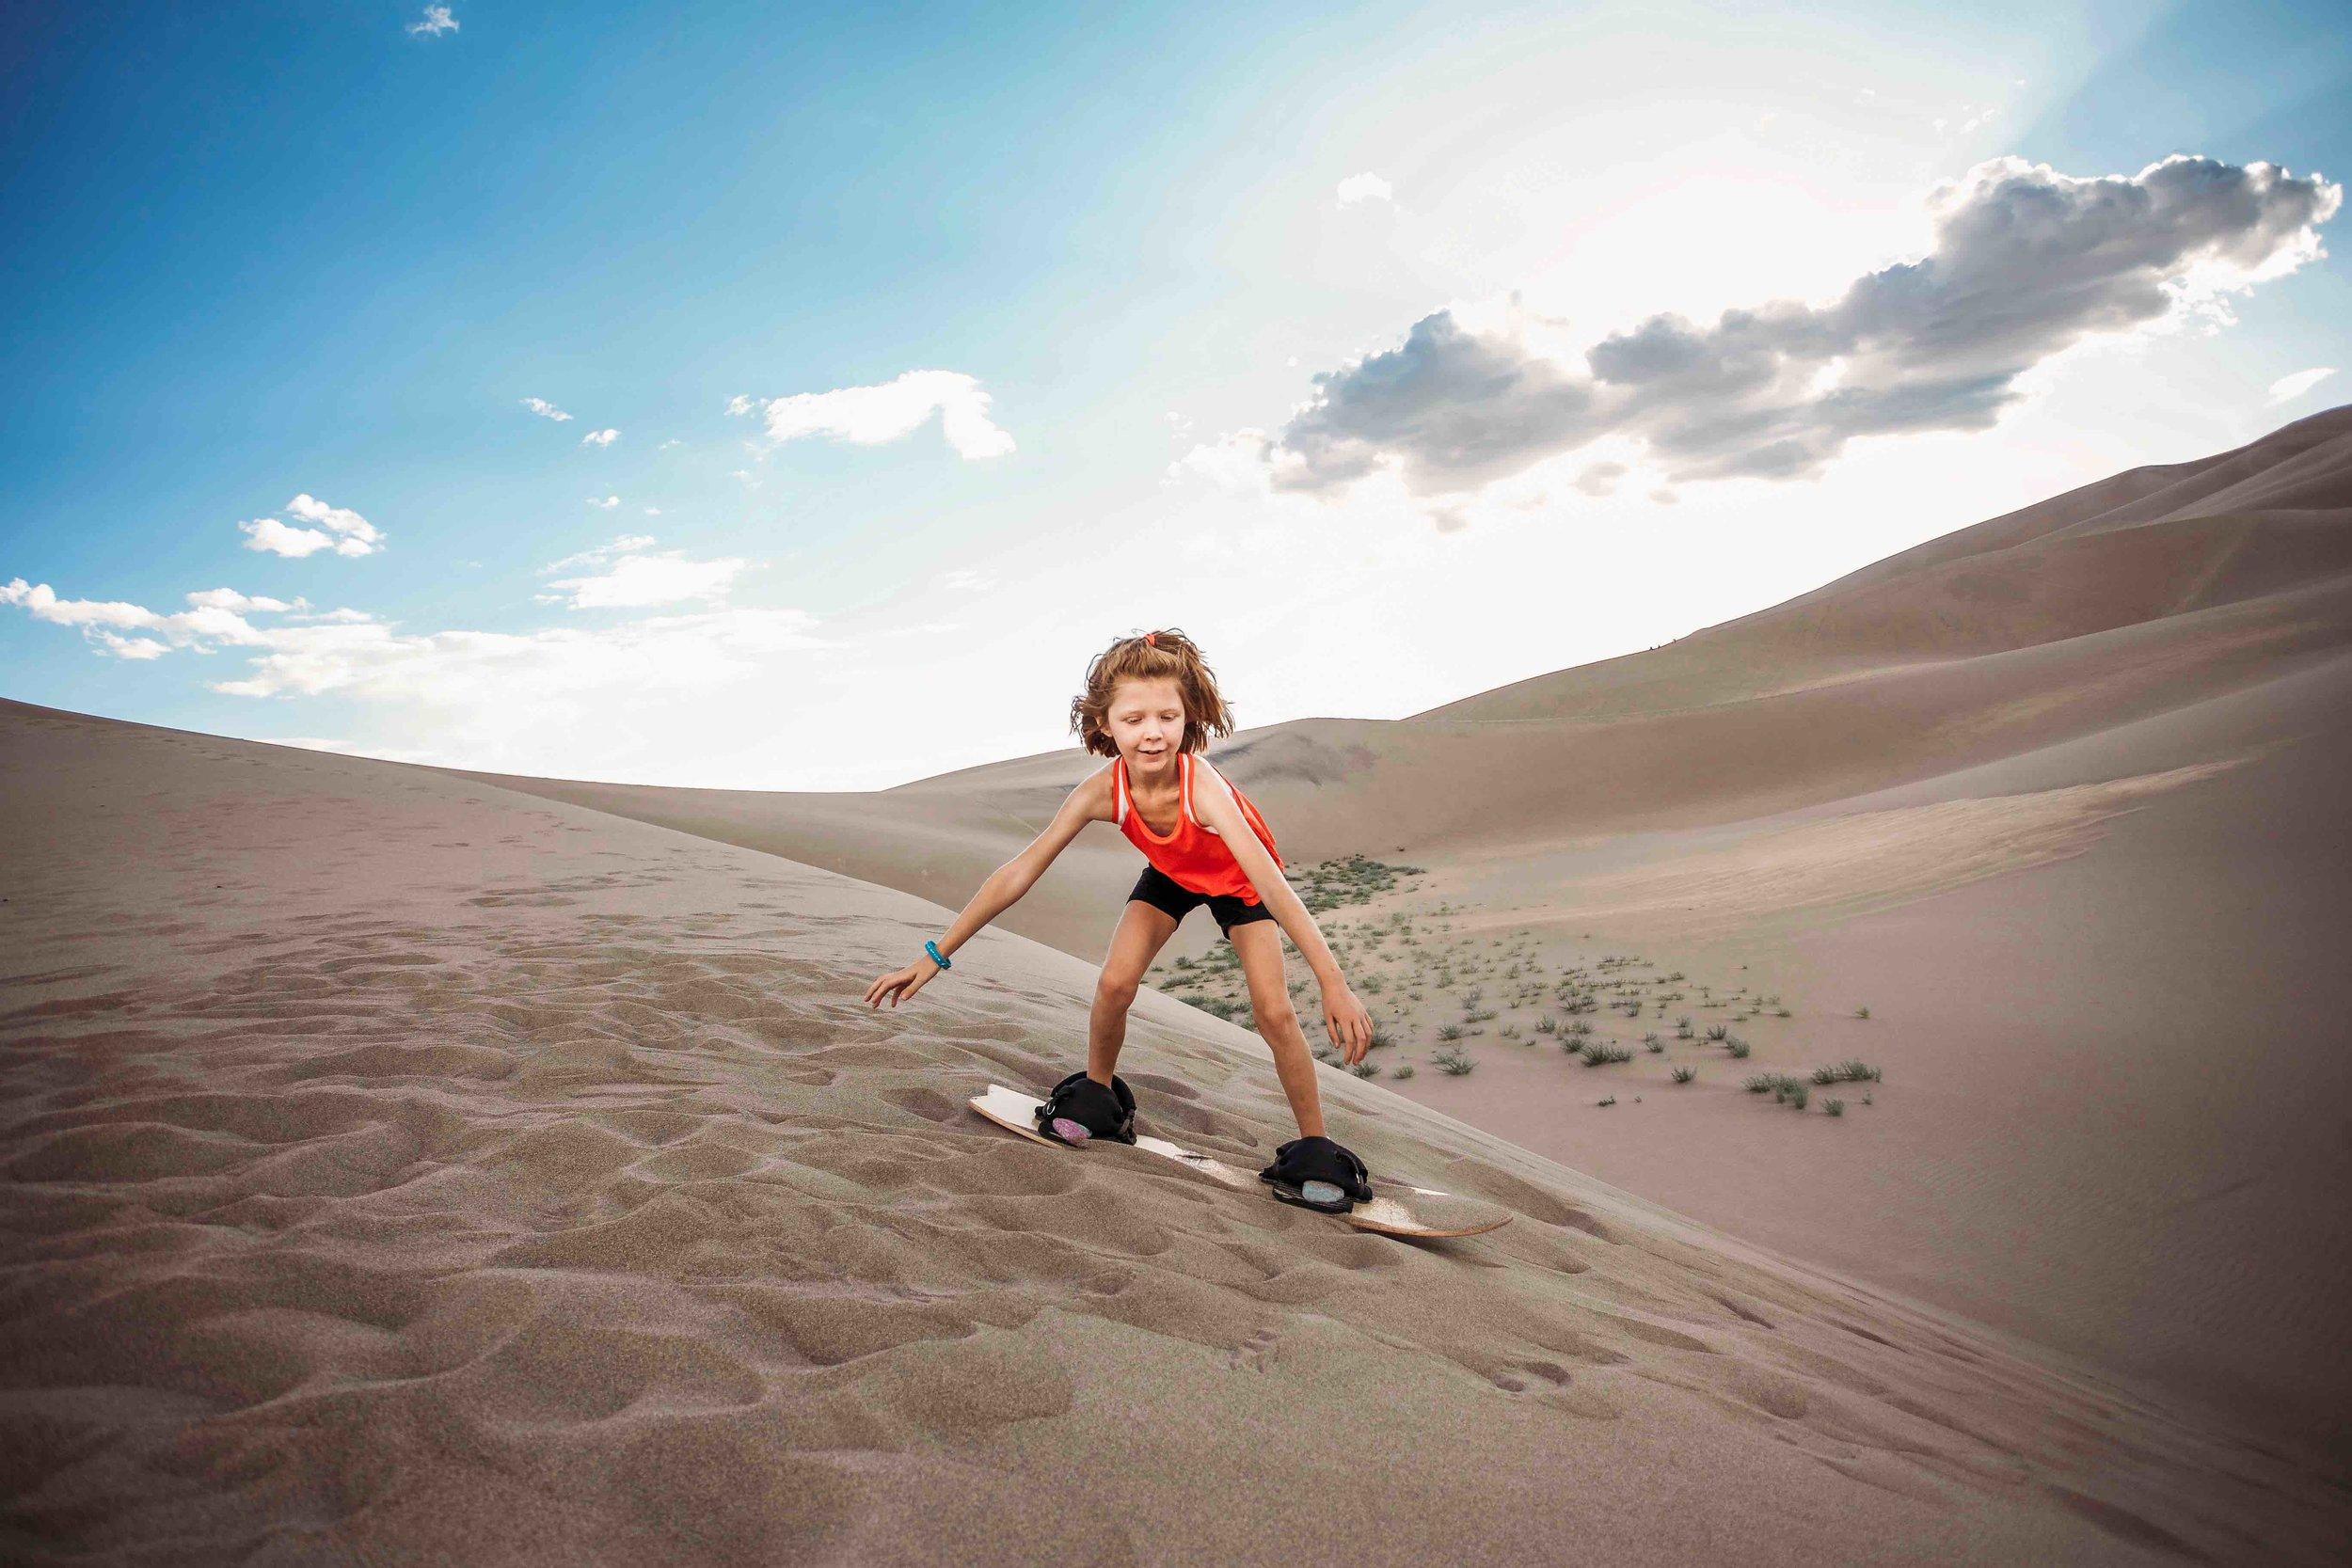 Boondocking near Great Sand Dunes National Park00020.jpeg